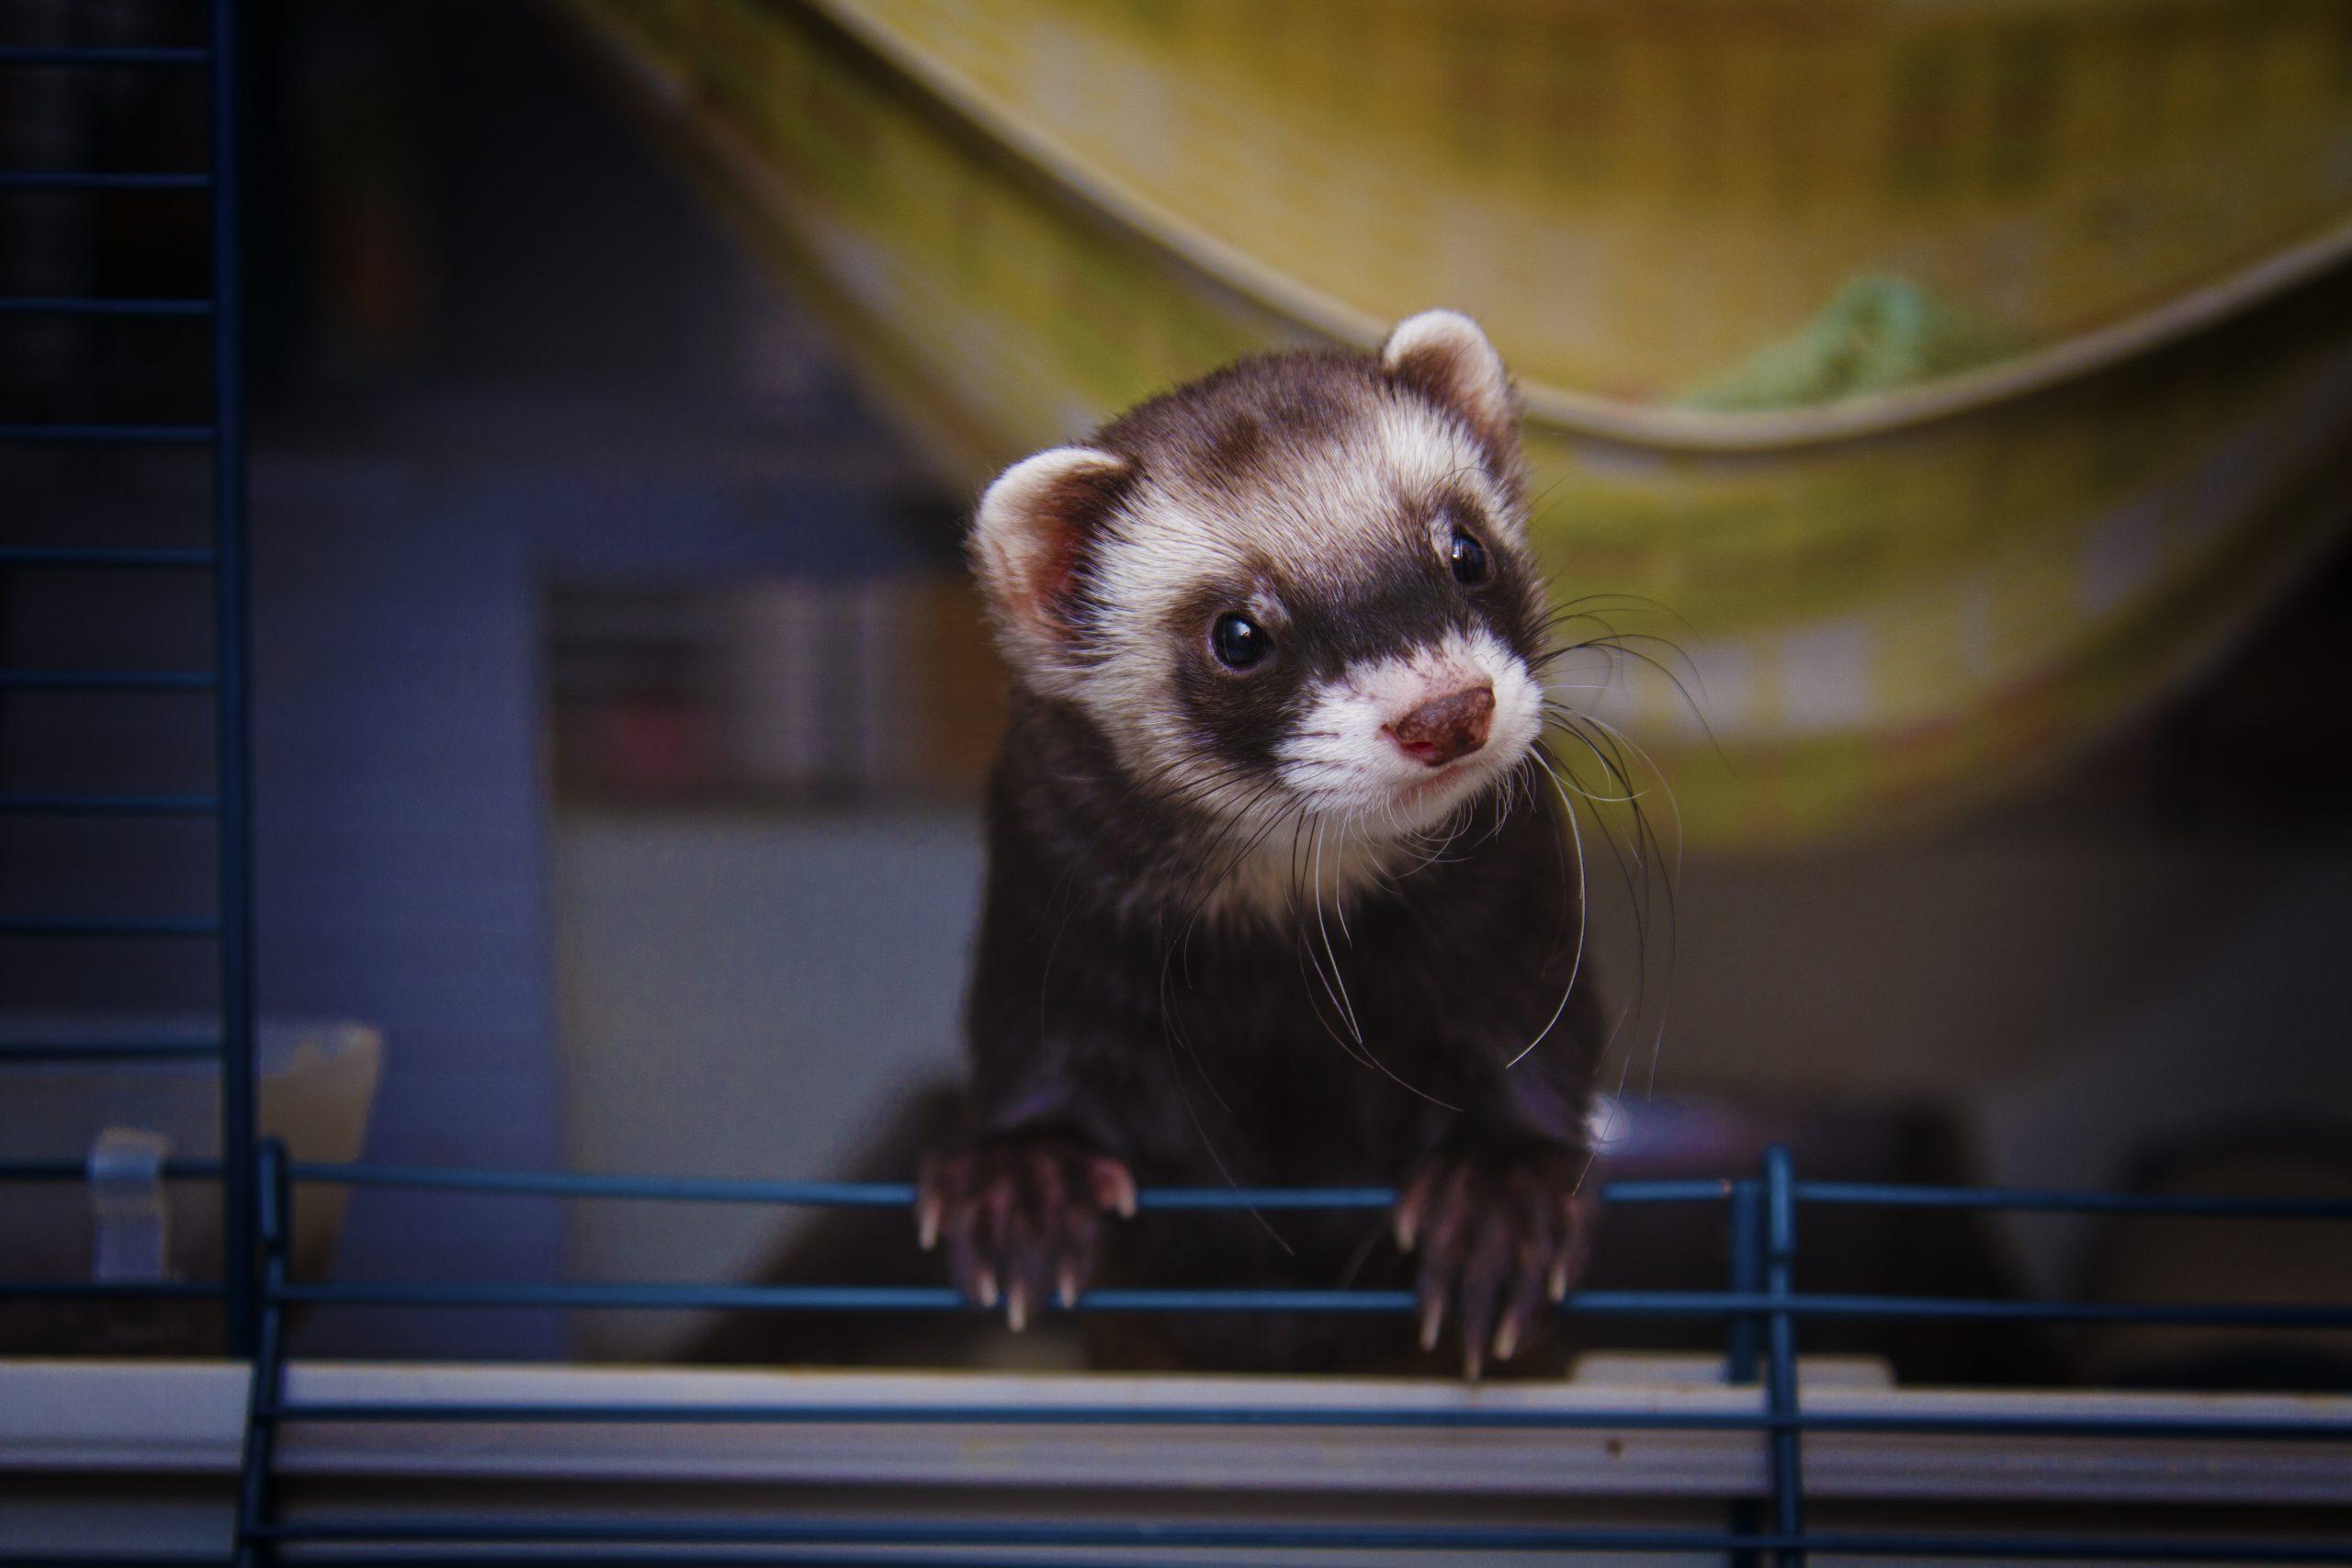 Beautiful ferret or weasel resting in a nest